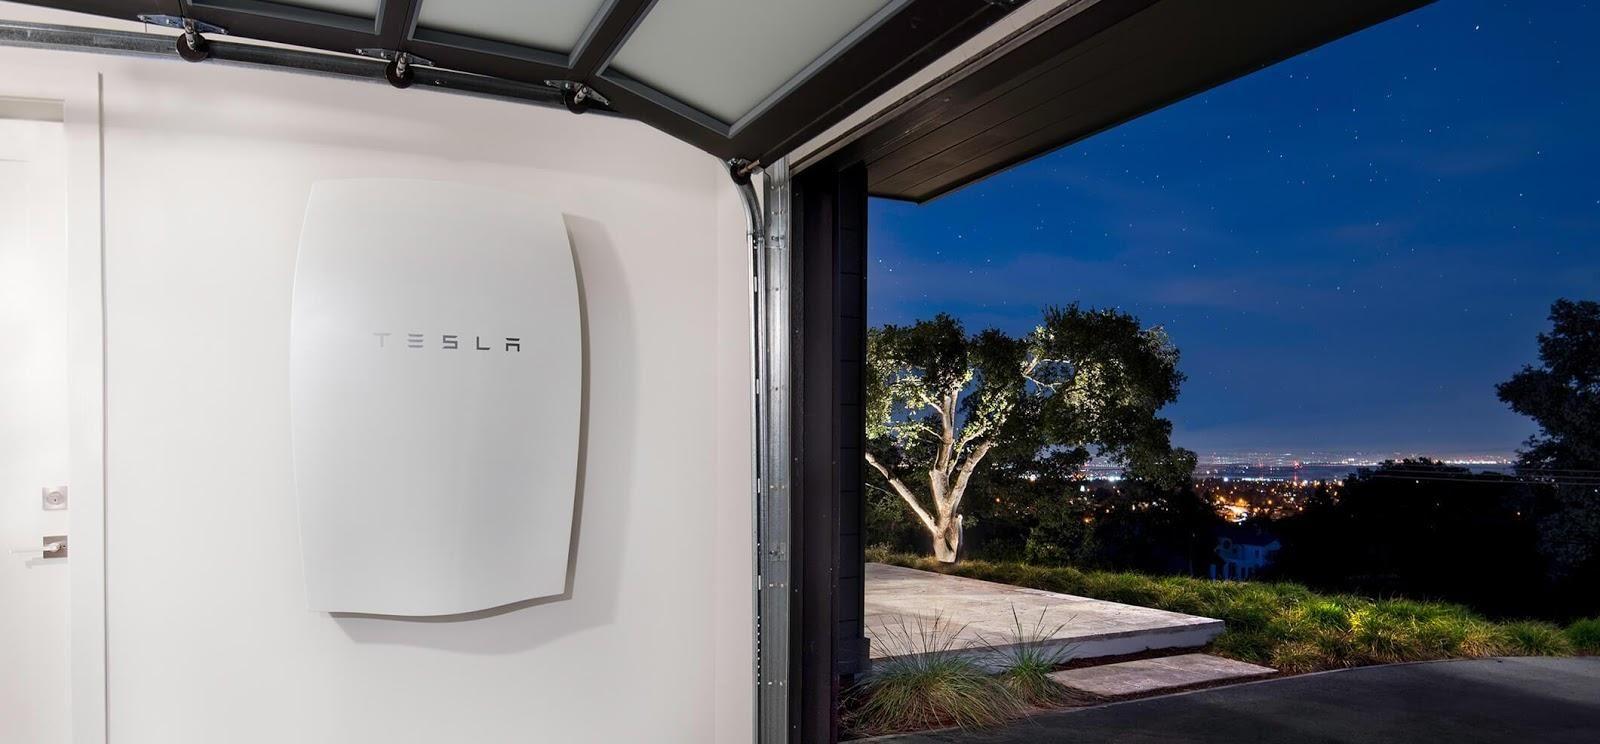 Tesla Powerwalls Solar Panels Sent To Puerto Rico Solar Roof Solar Solar Energy